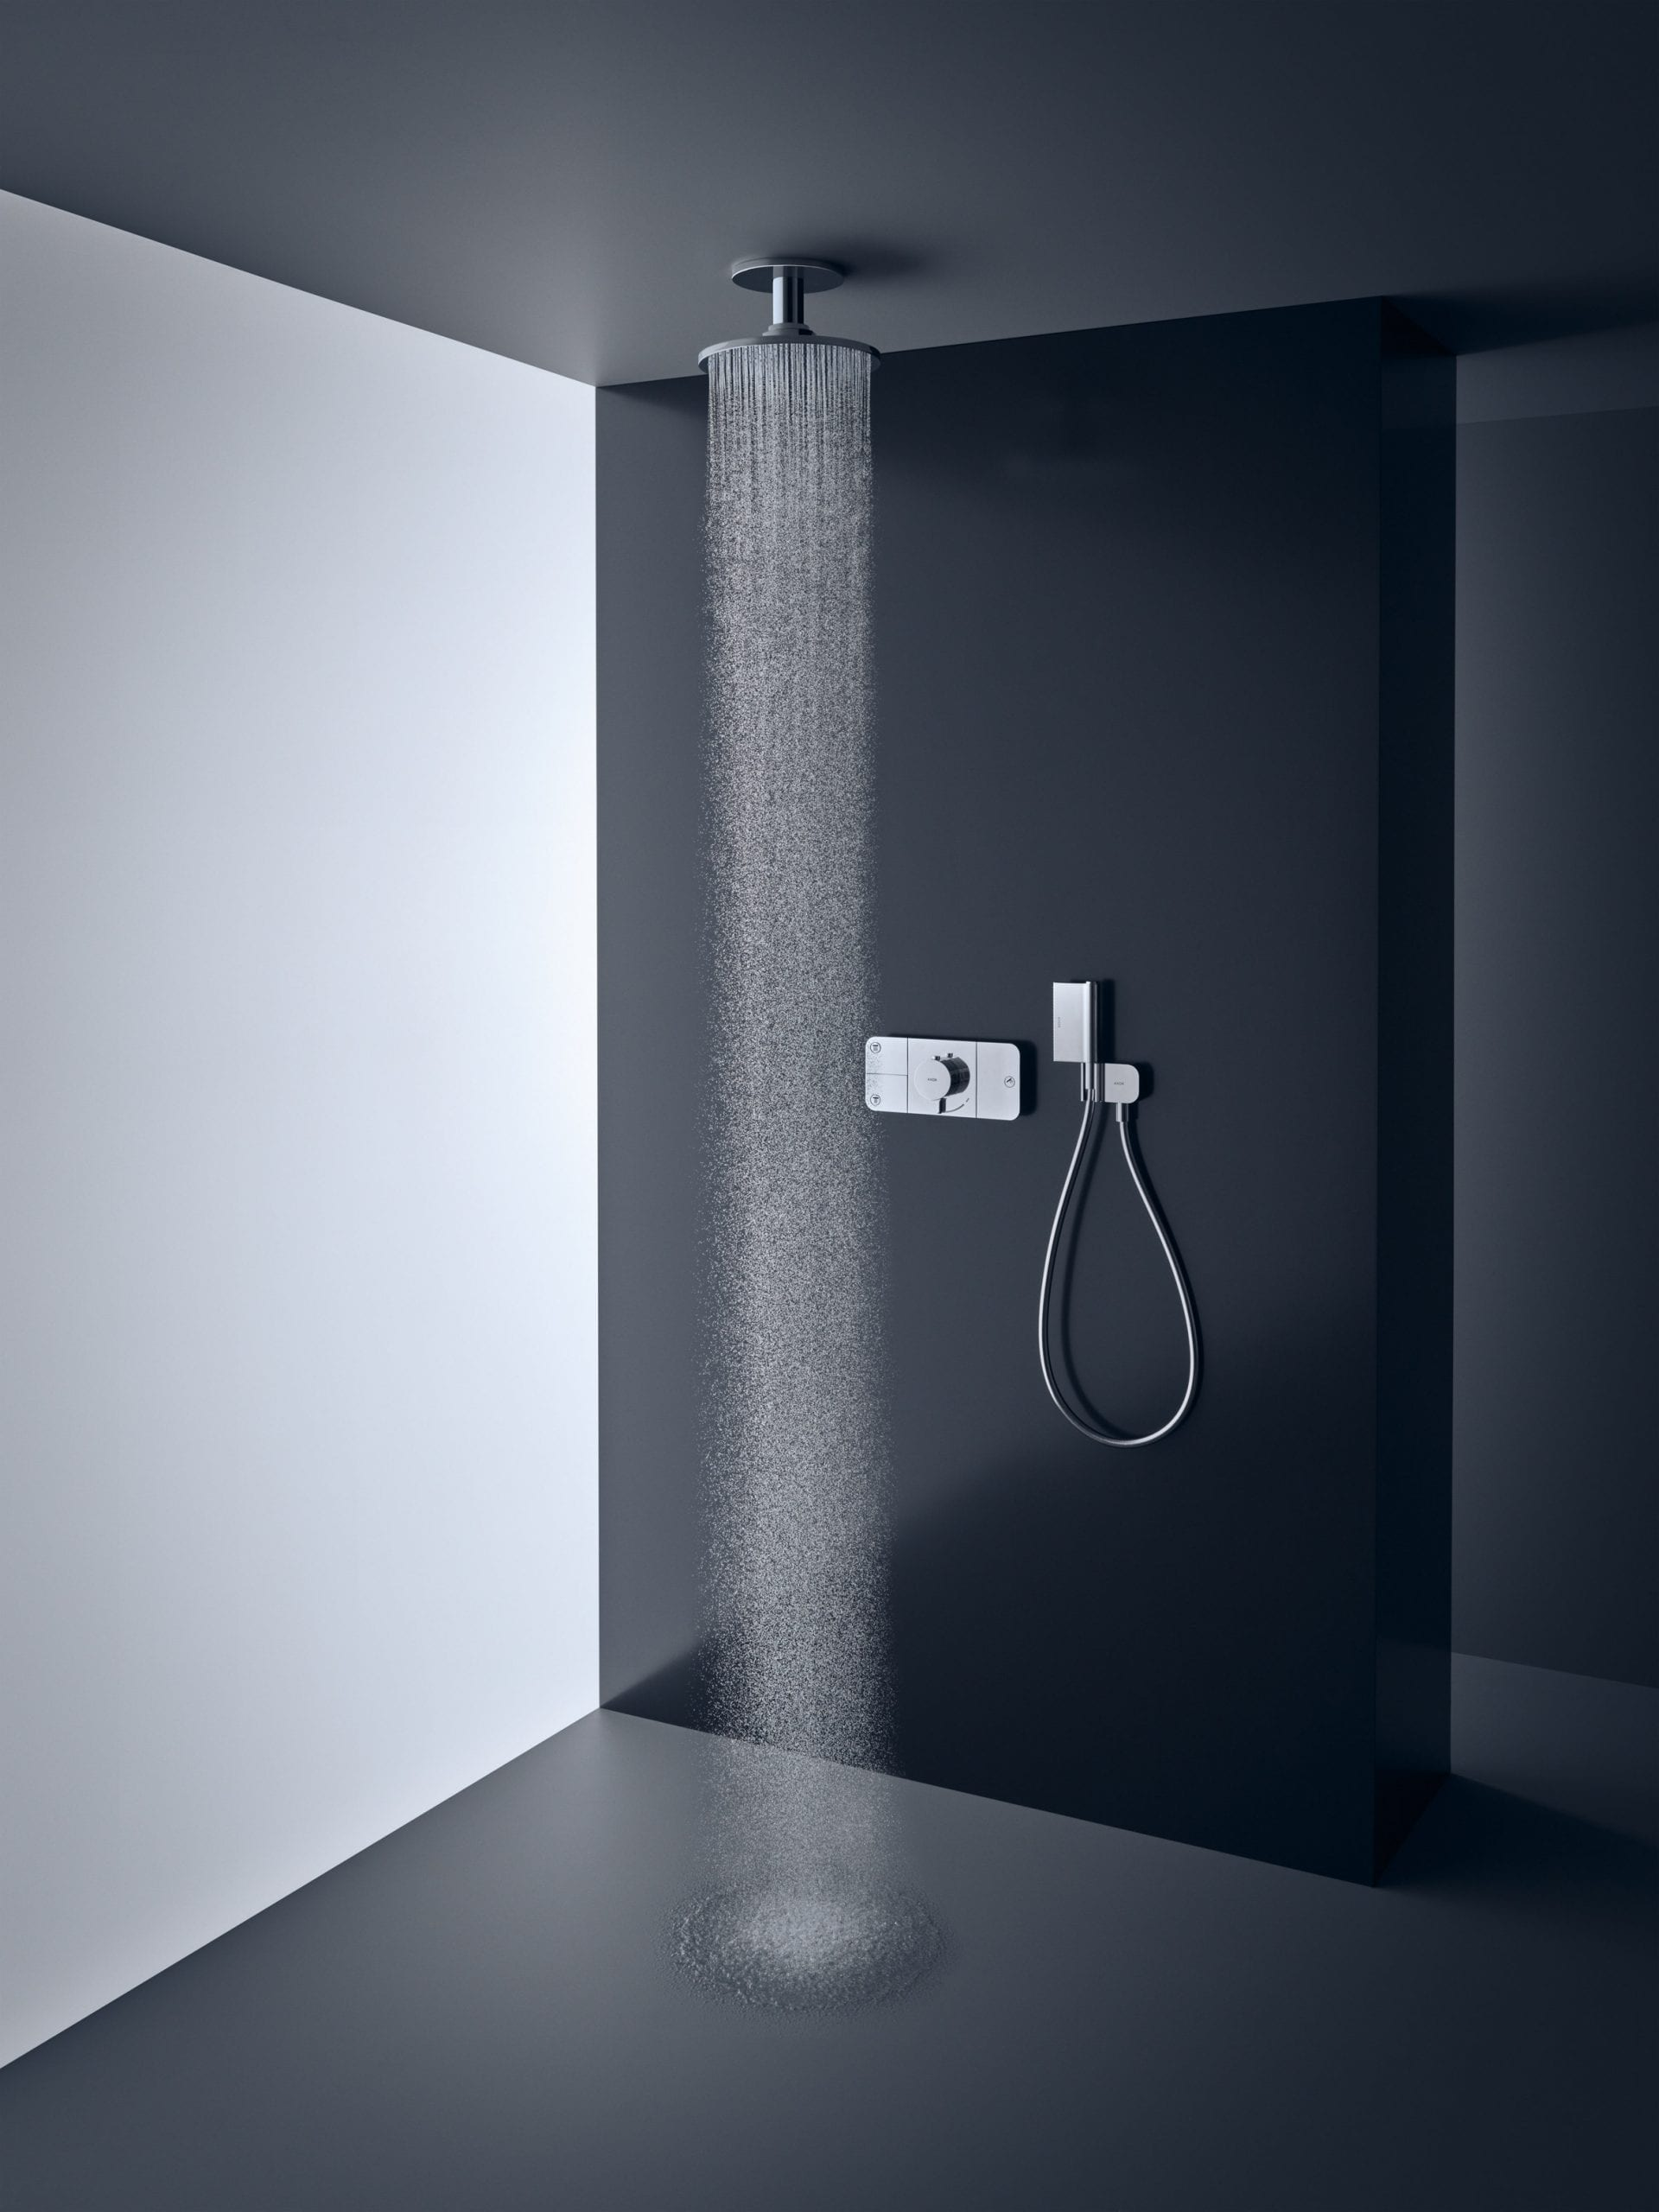 Axor showers by Phoenix Design for Axor